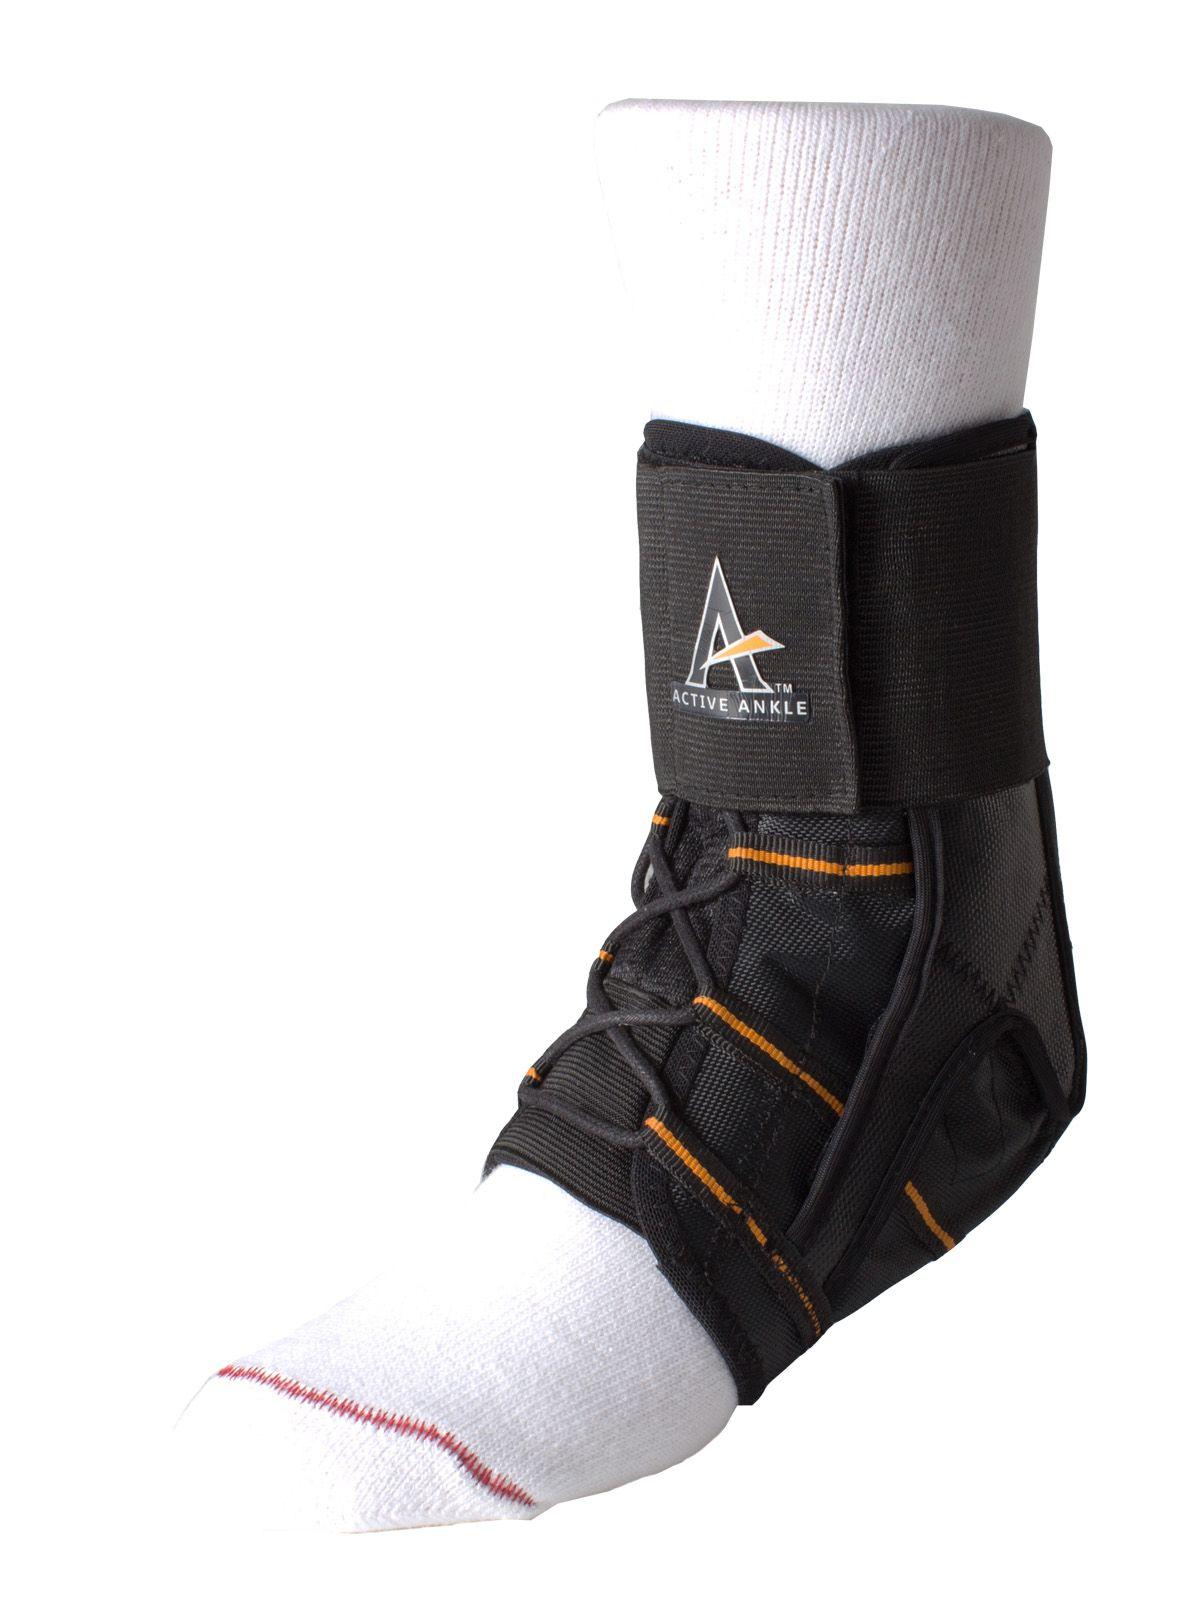 Lace Up Ankle Braces Power Lacer Ankle Brace Ankle Braces Braces Ankle